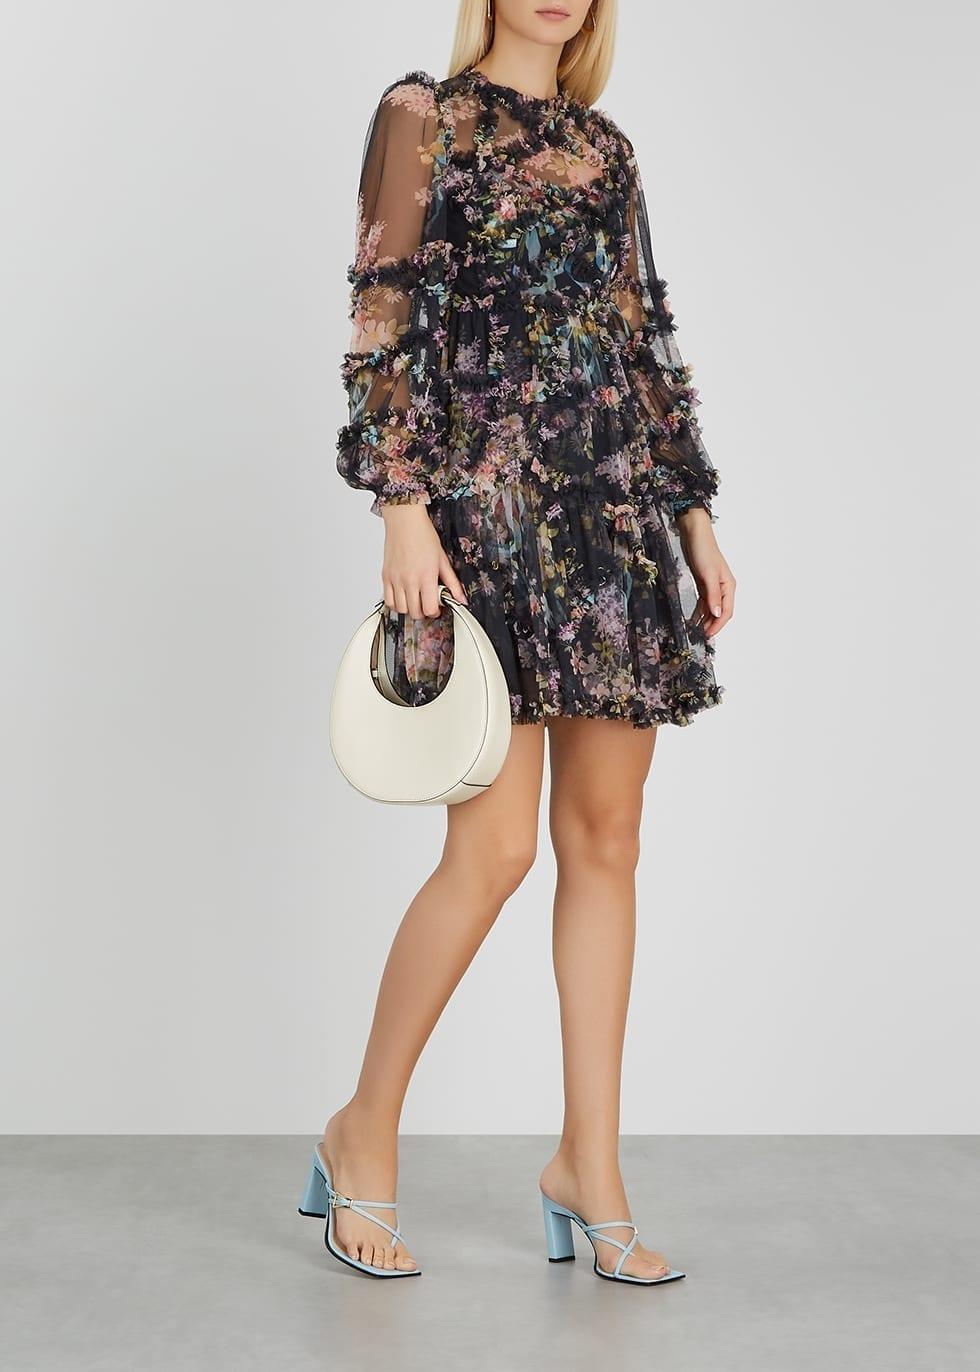 NEEDLE & THREAD Floral Diamond Ruffle-trimmed Tulle Mini Dress